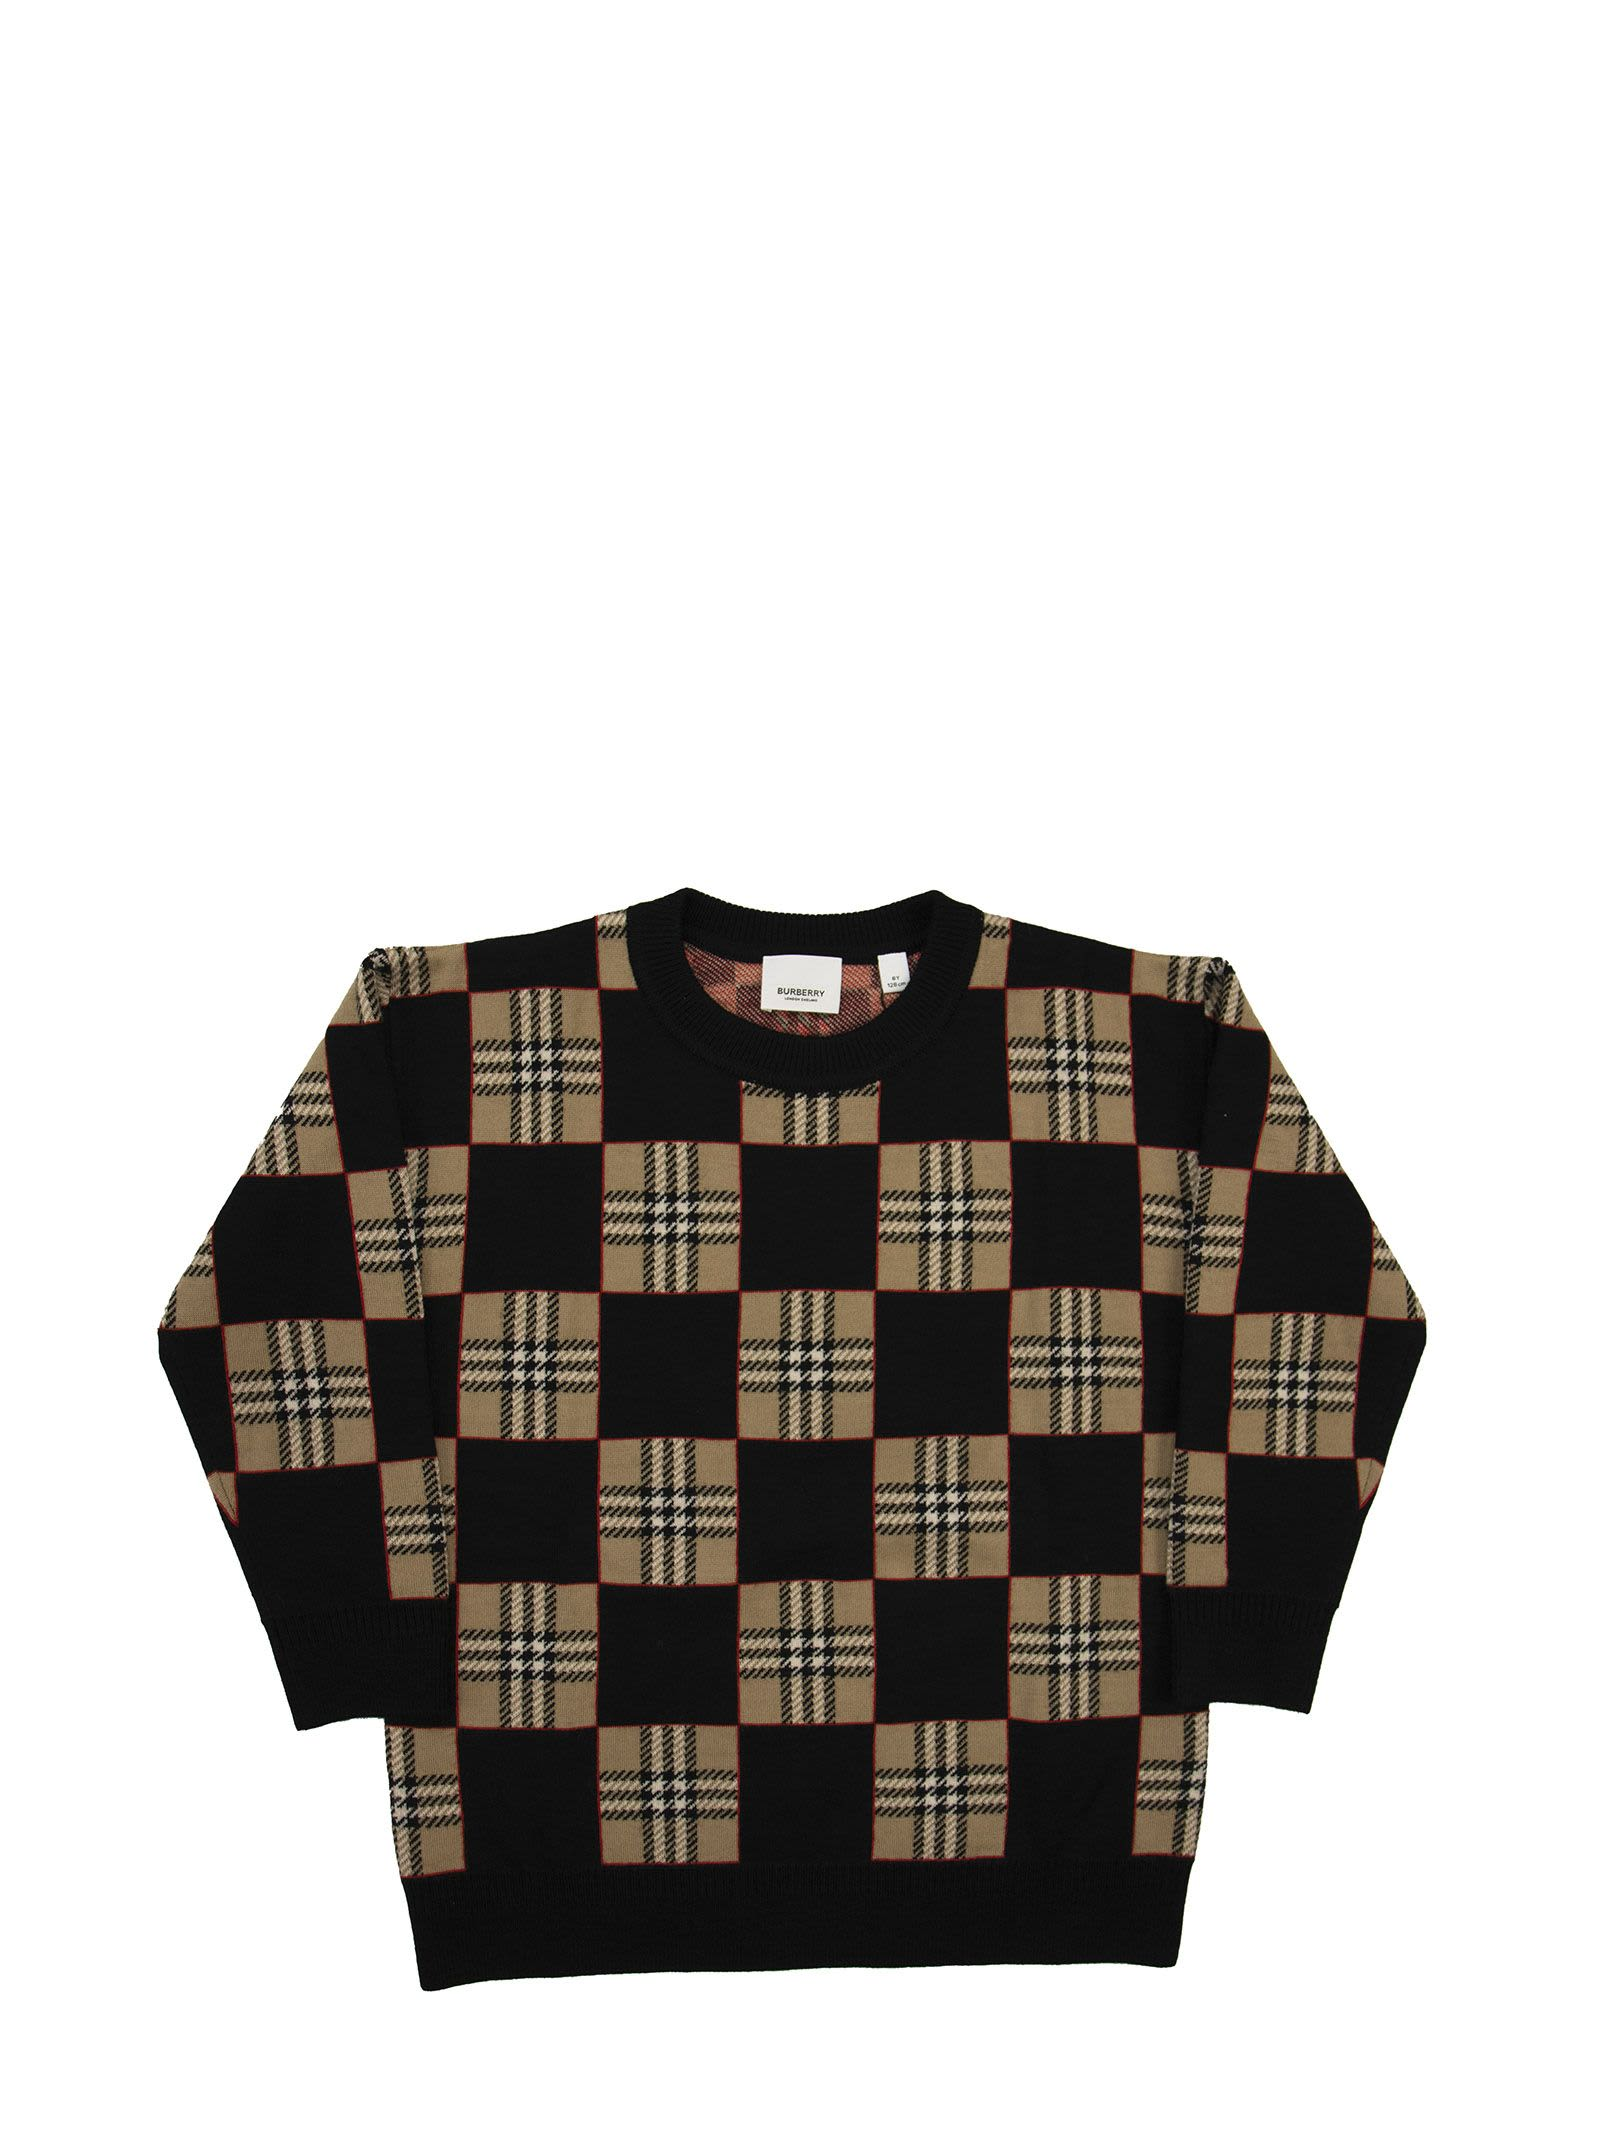 Burberry Kids' Rickman Merino Wool Jacquard Sweater In Archive Beige